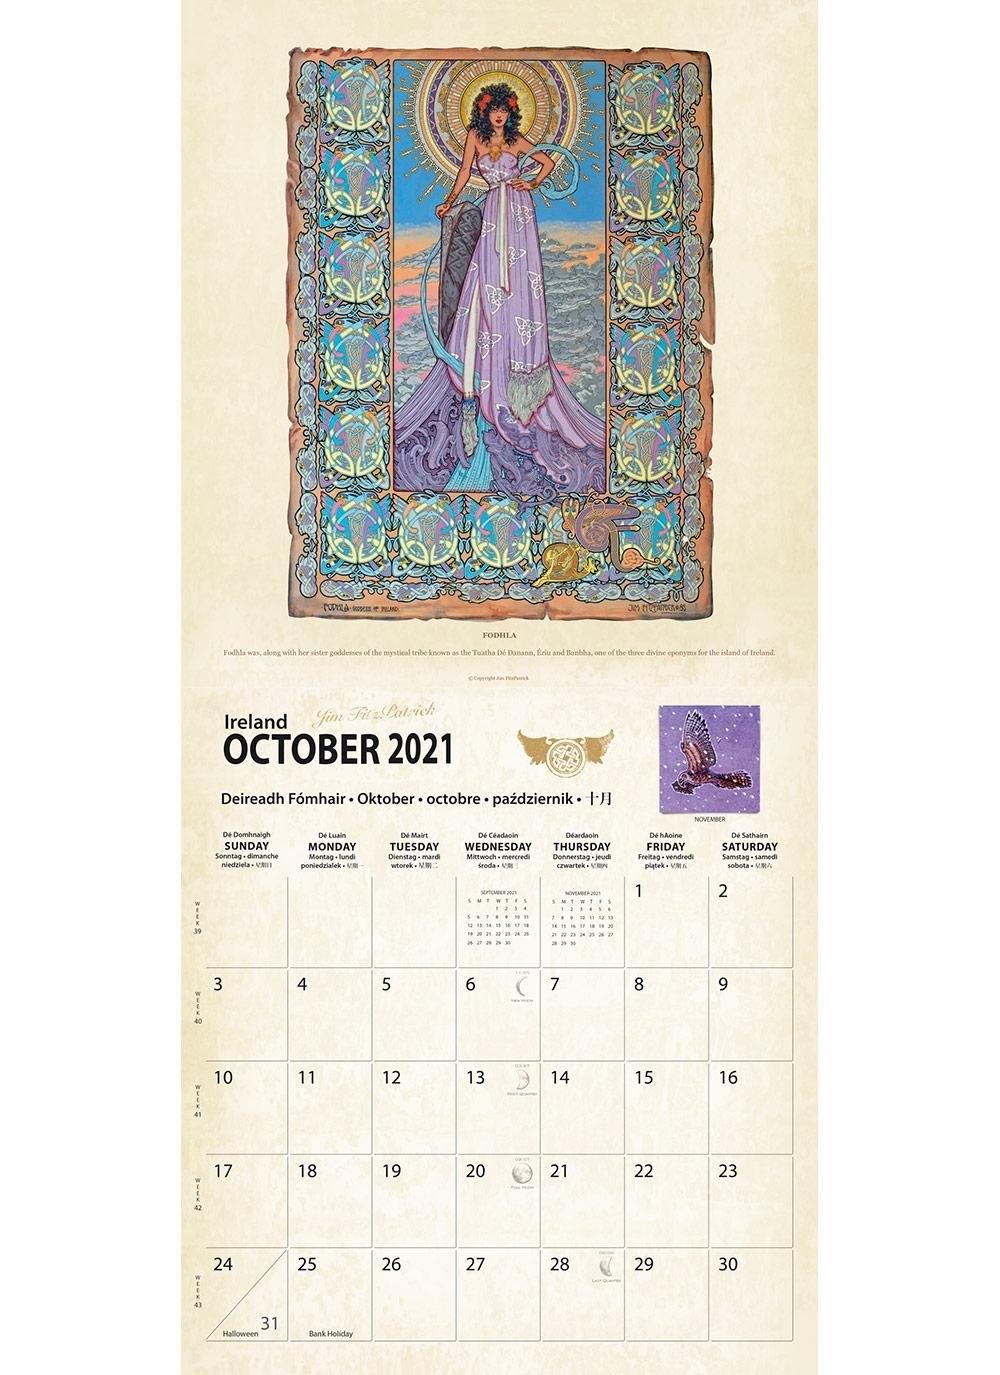 Celtic Mythology 2021 Calendar | Blarney inside 2021 Calendar Trinidad And Tobago